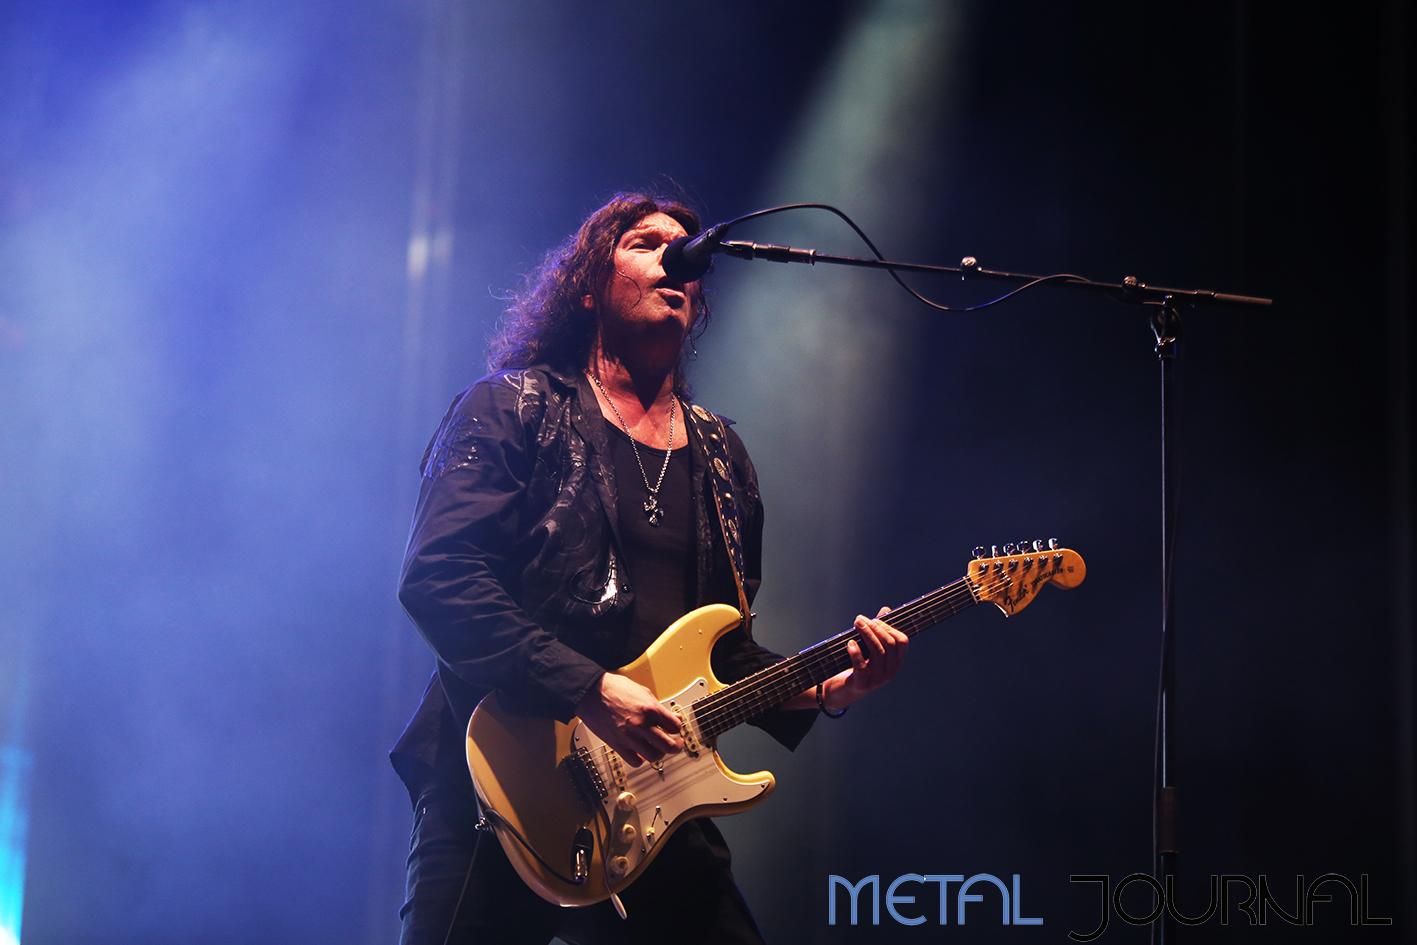 europe - metal journal rock fest barcelona 2019 pic 6